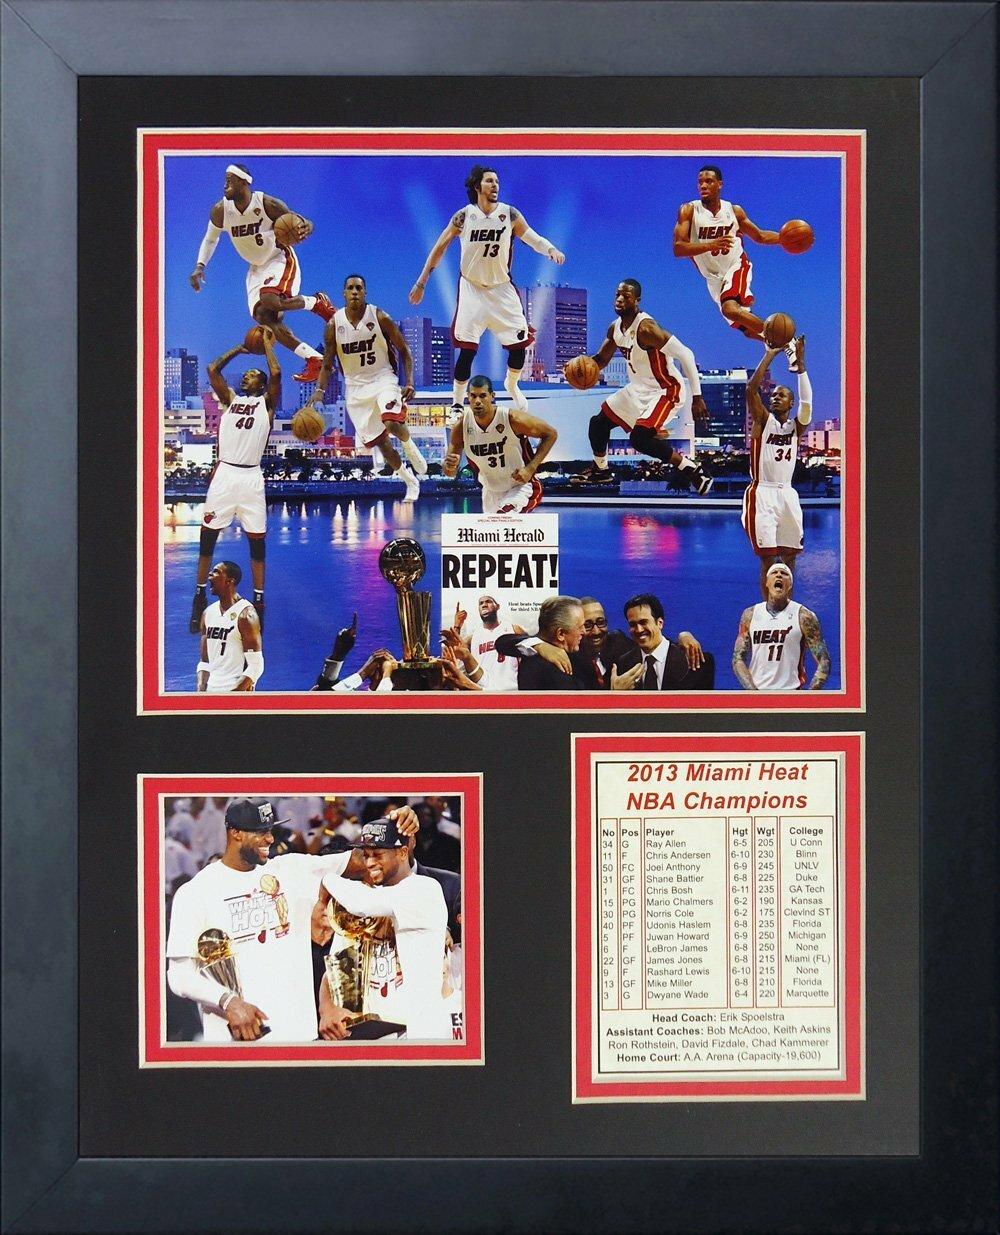 Legends Never 2017 Miami Heat Nba Champions Framed Memorabilia Wayfair